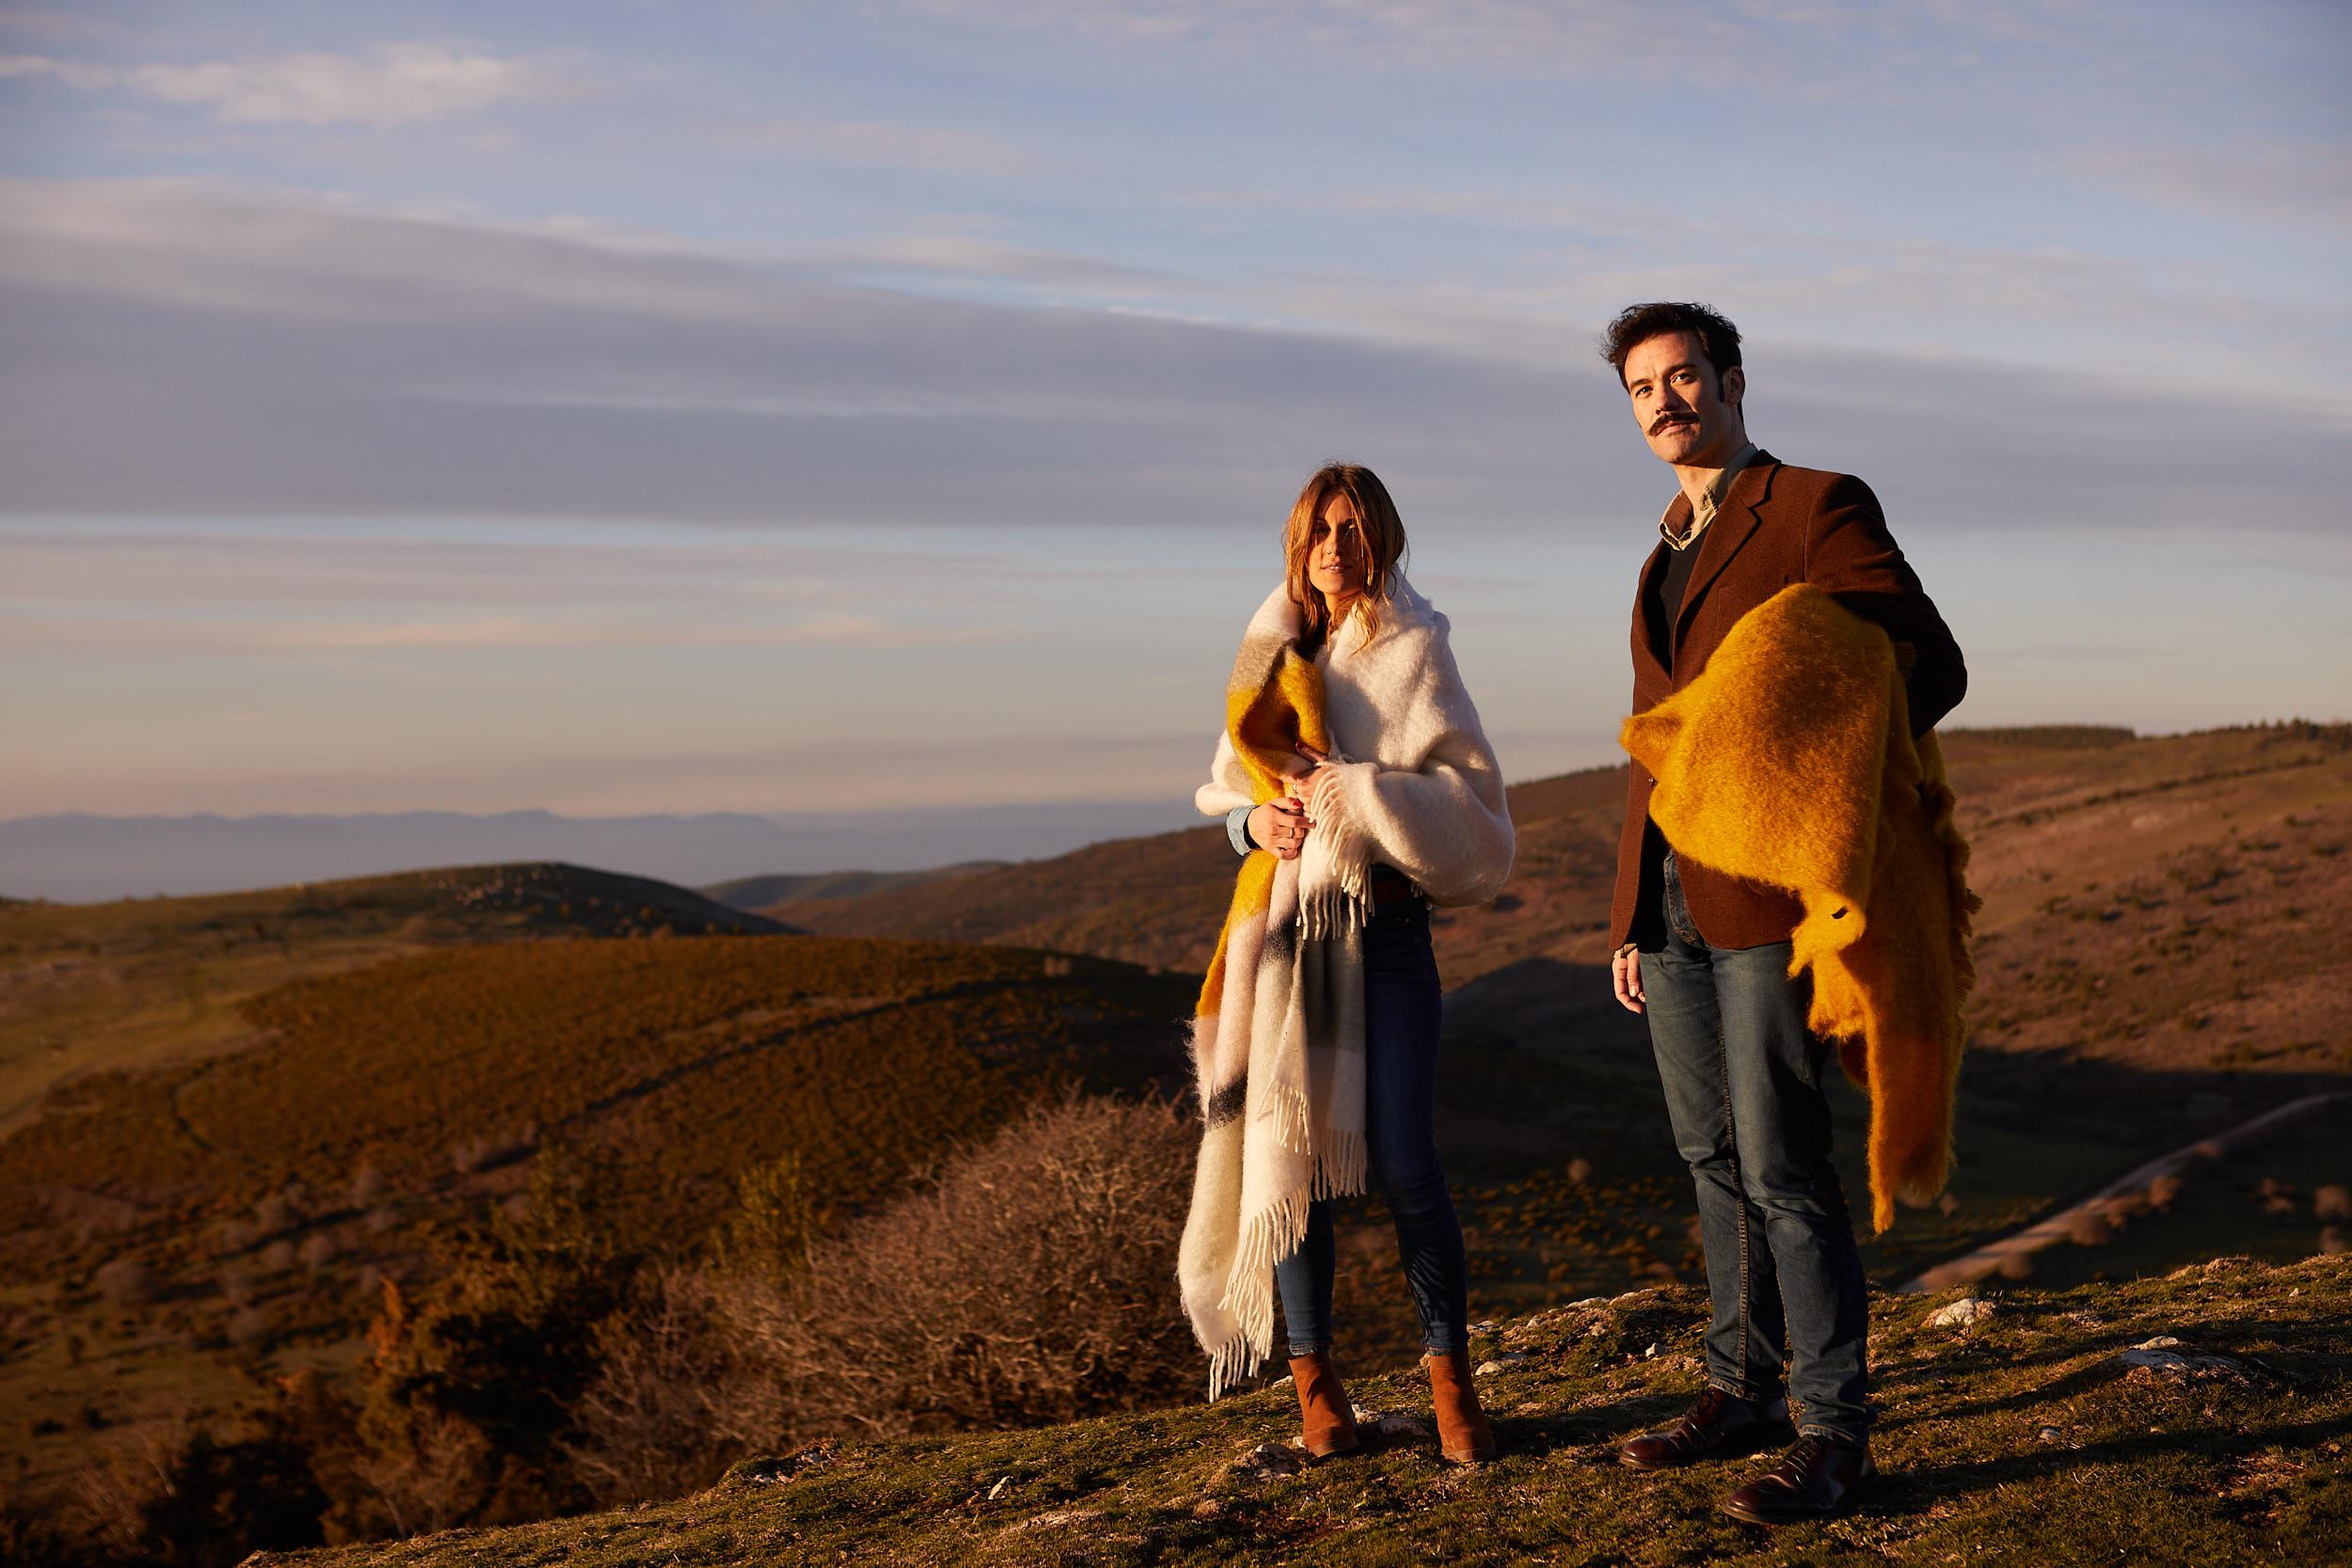 Mantas Ezcaray_Commercial_Photography_ La Rioja_James Sturcke_Sturcke.org_006.jpg